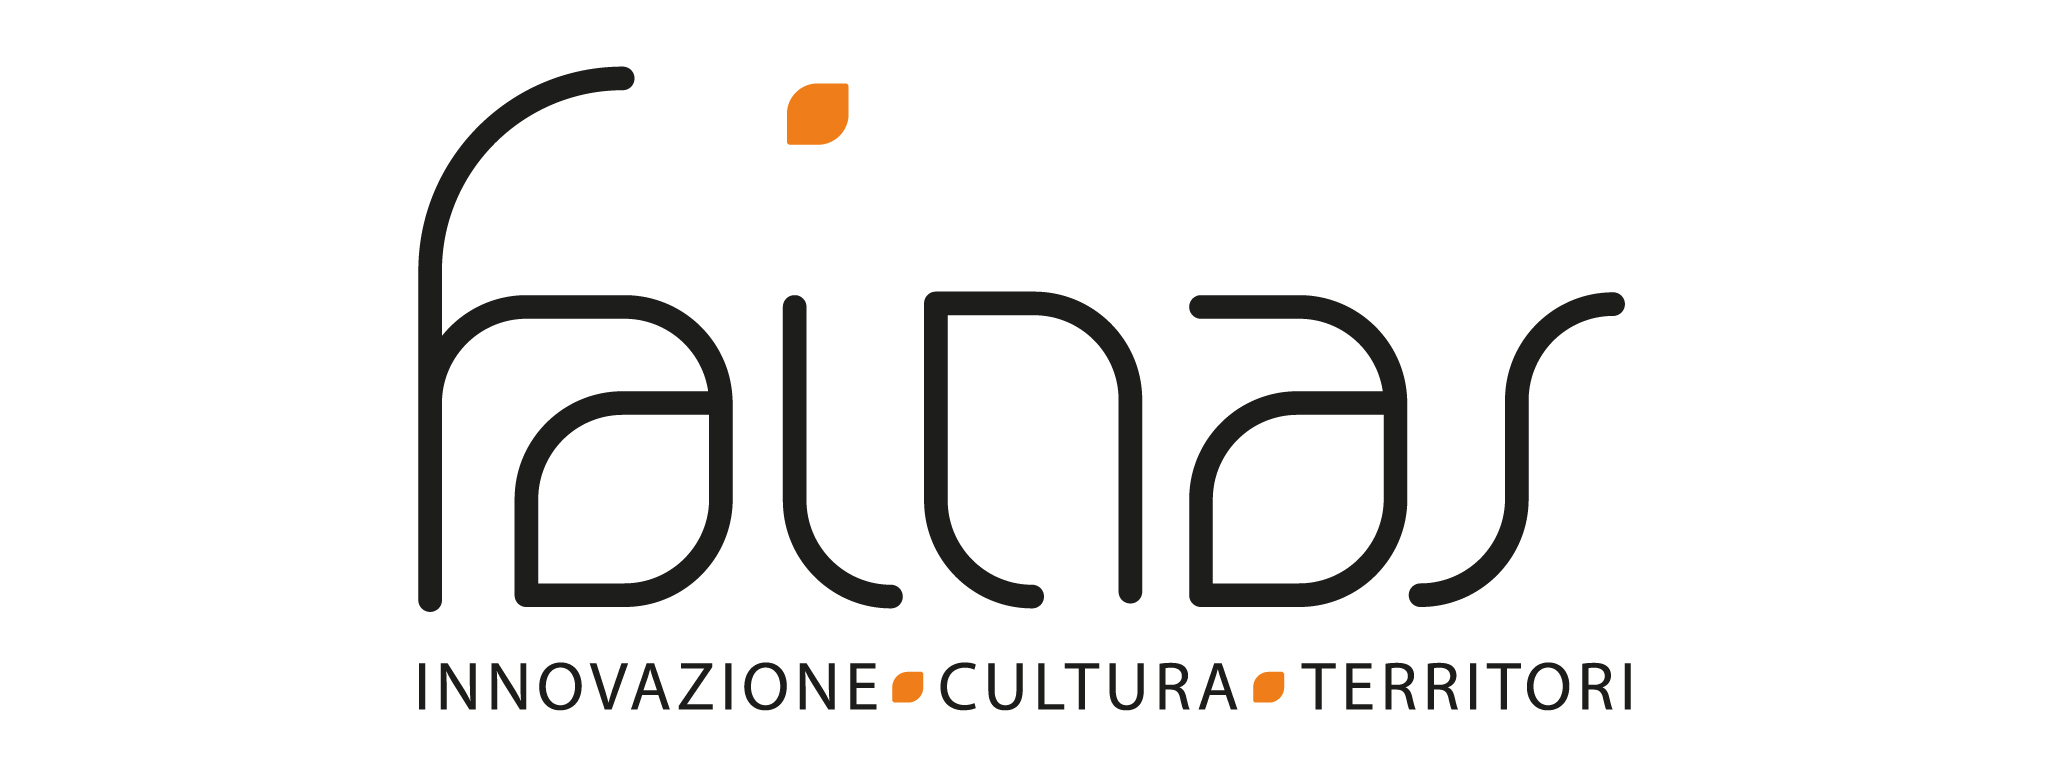 associazione fainas - innovazione cultura territori